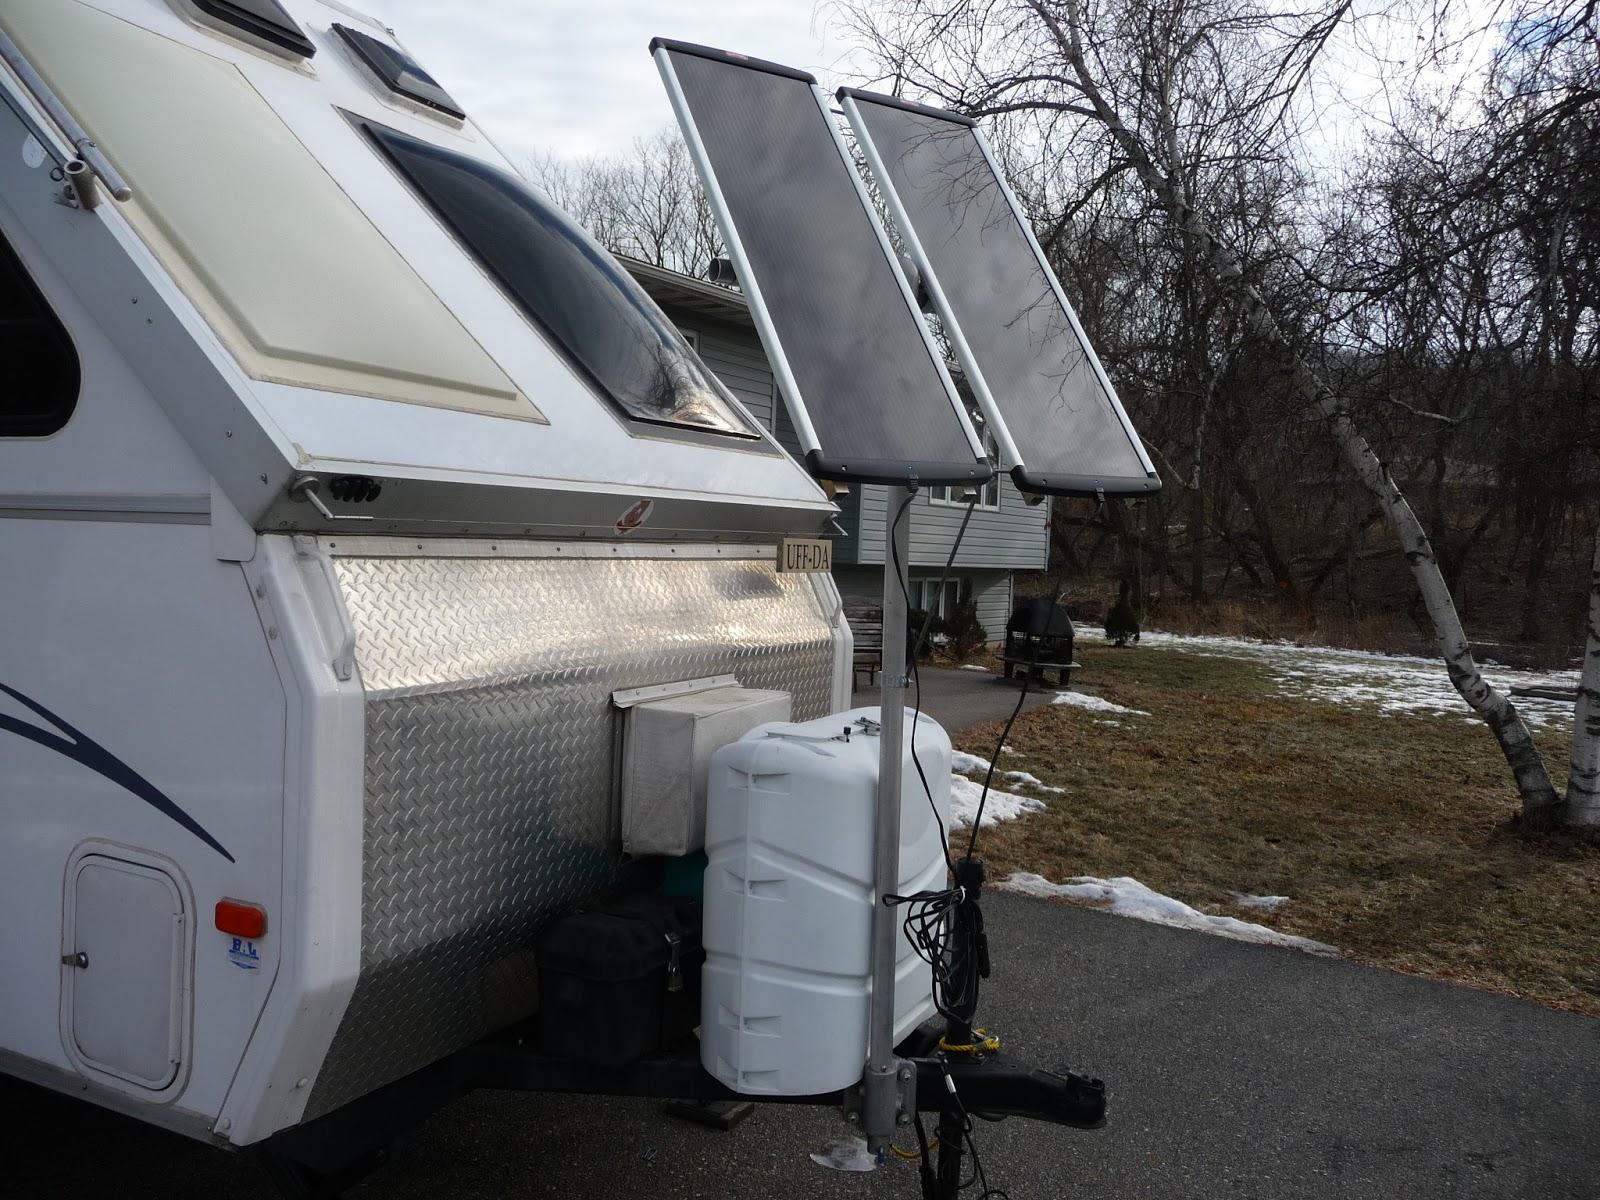 Dual 18 watt Coleman 1200 Solar Panels ... mounted on tongue